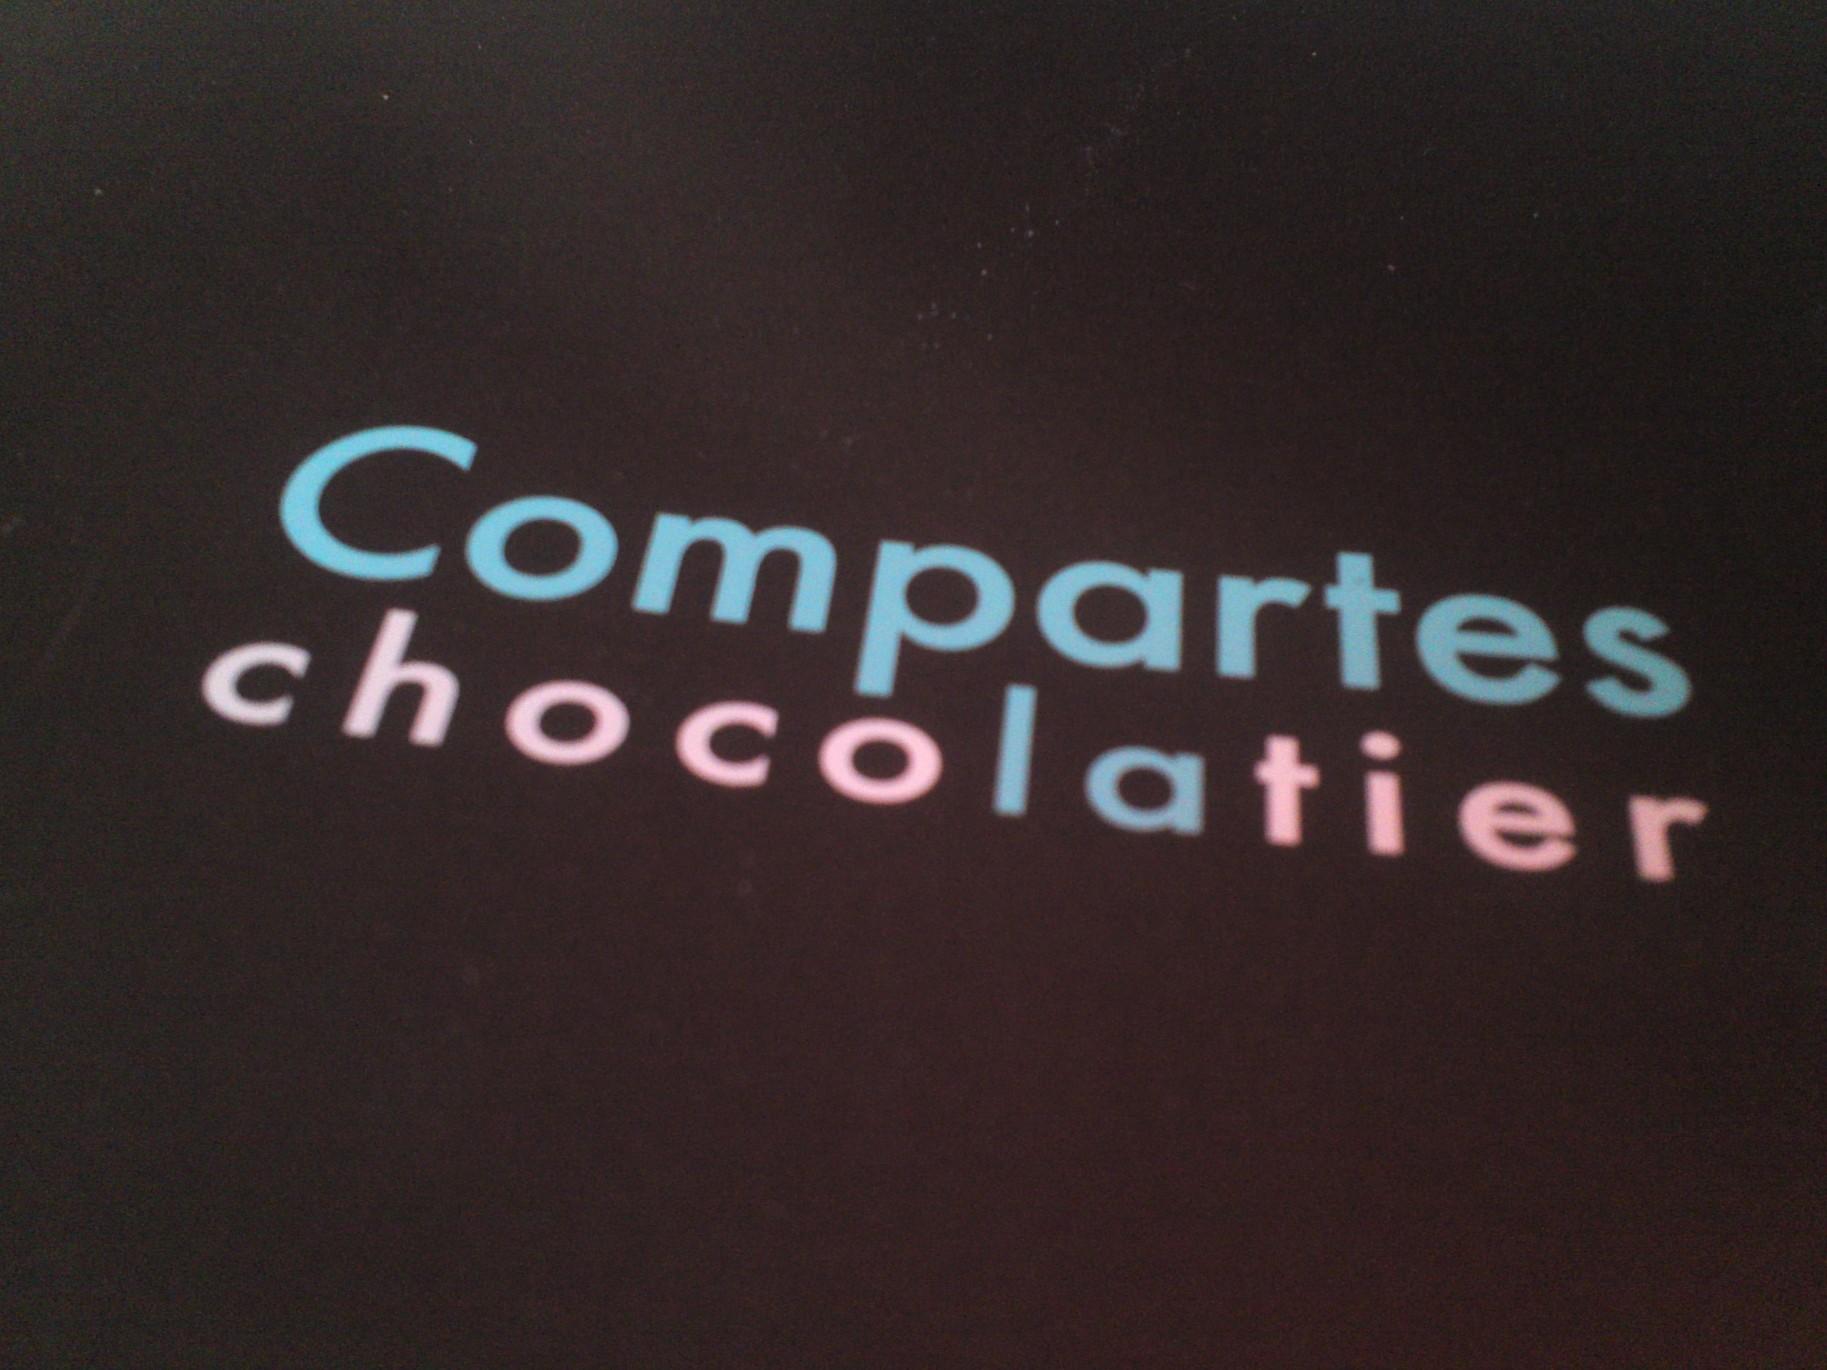 Compartes chocolatier �����@�a�J�X